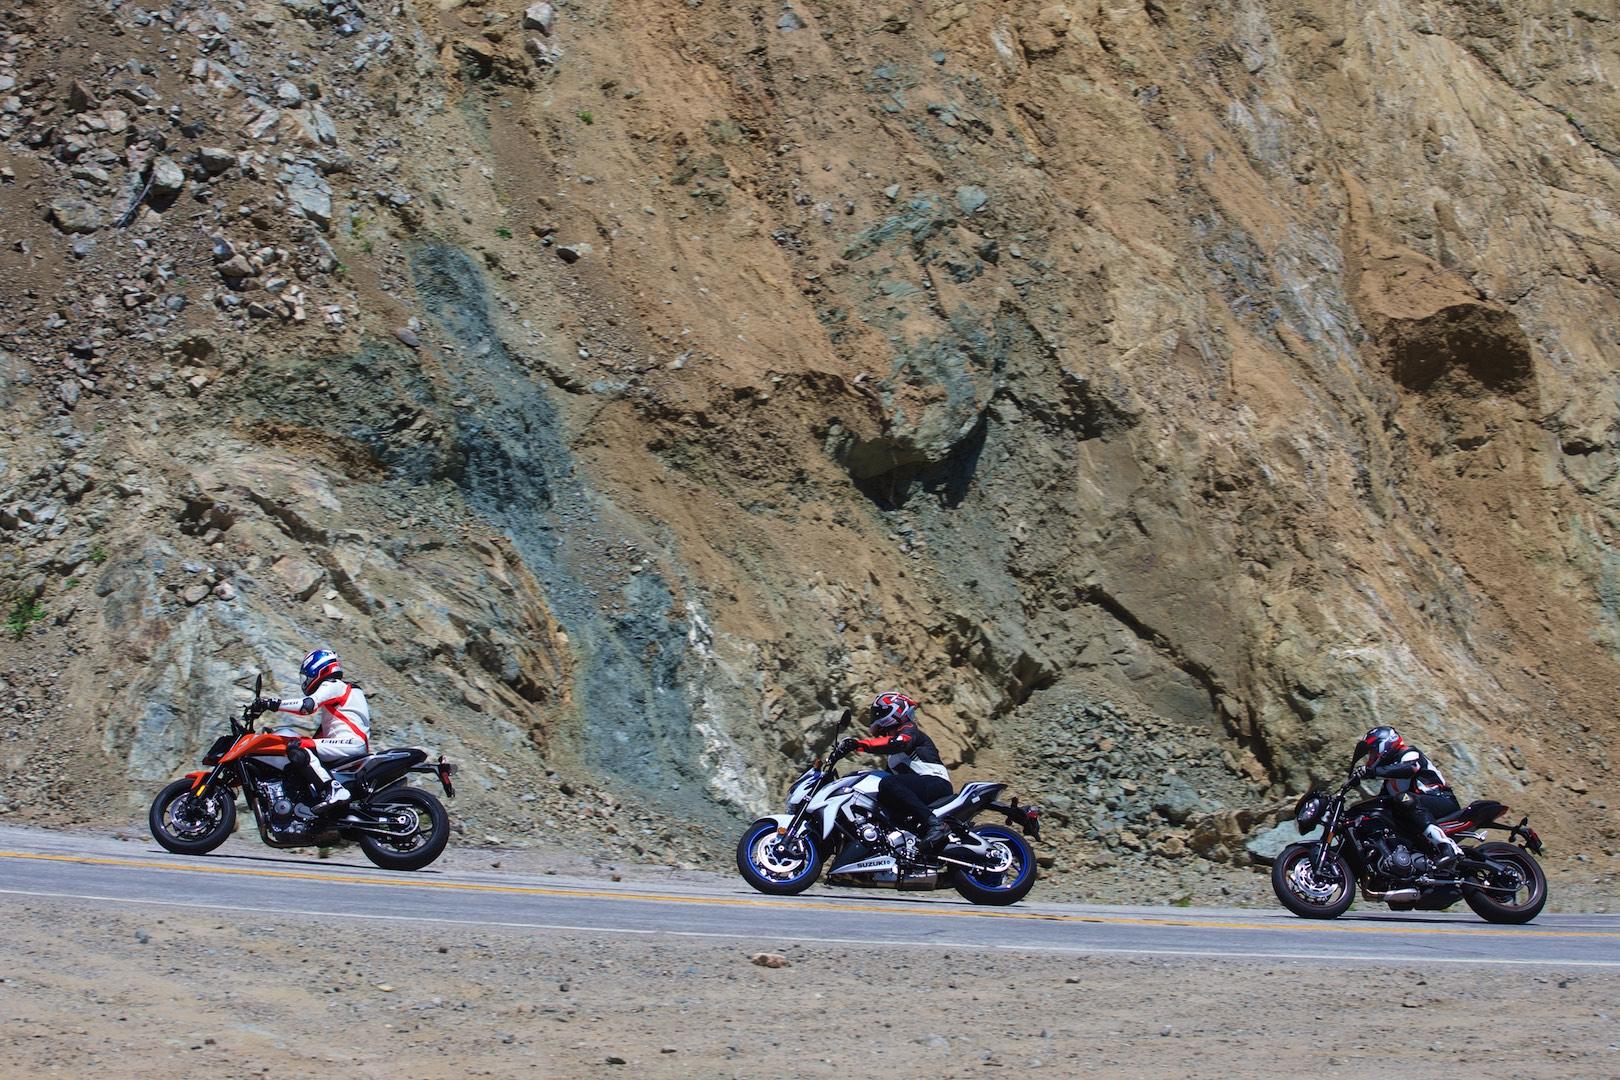 KTM Vs Triumph Vs Suzuki Naked Sportbike